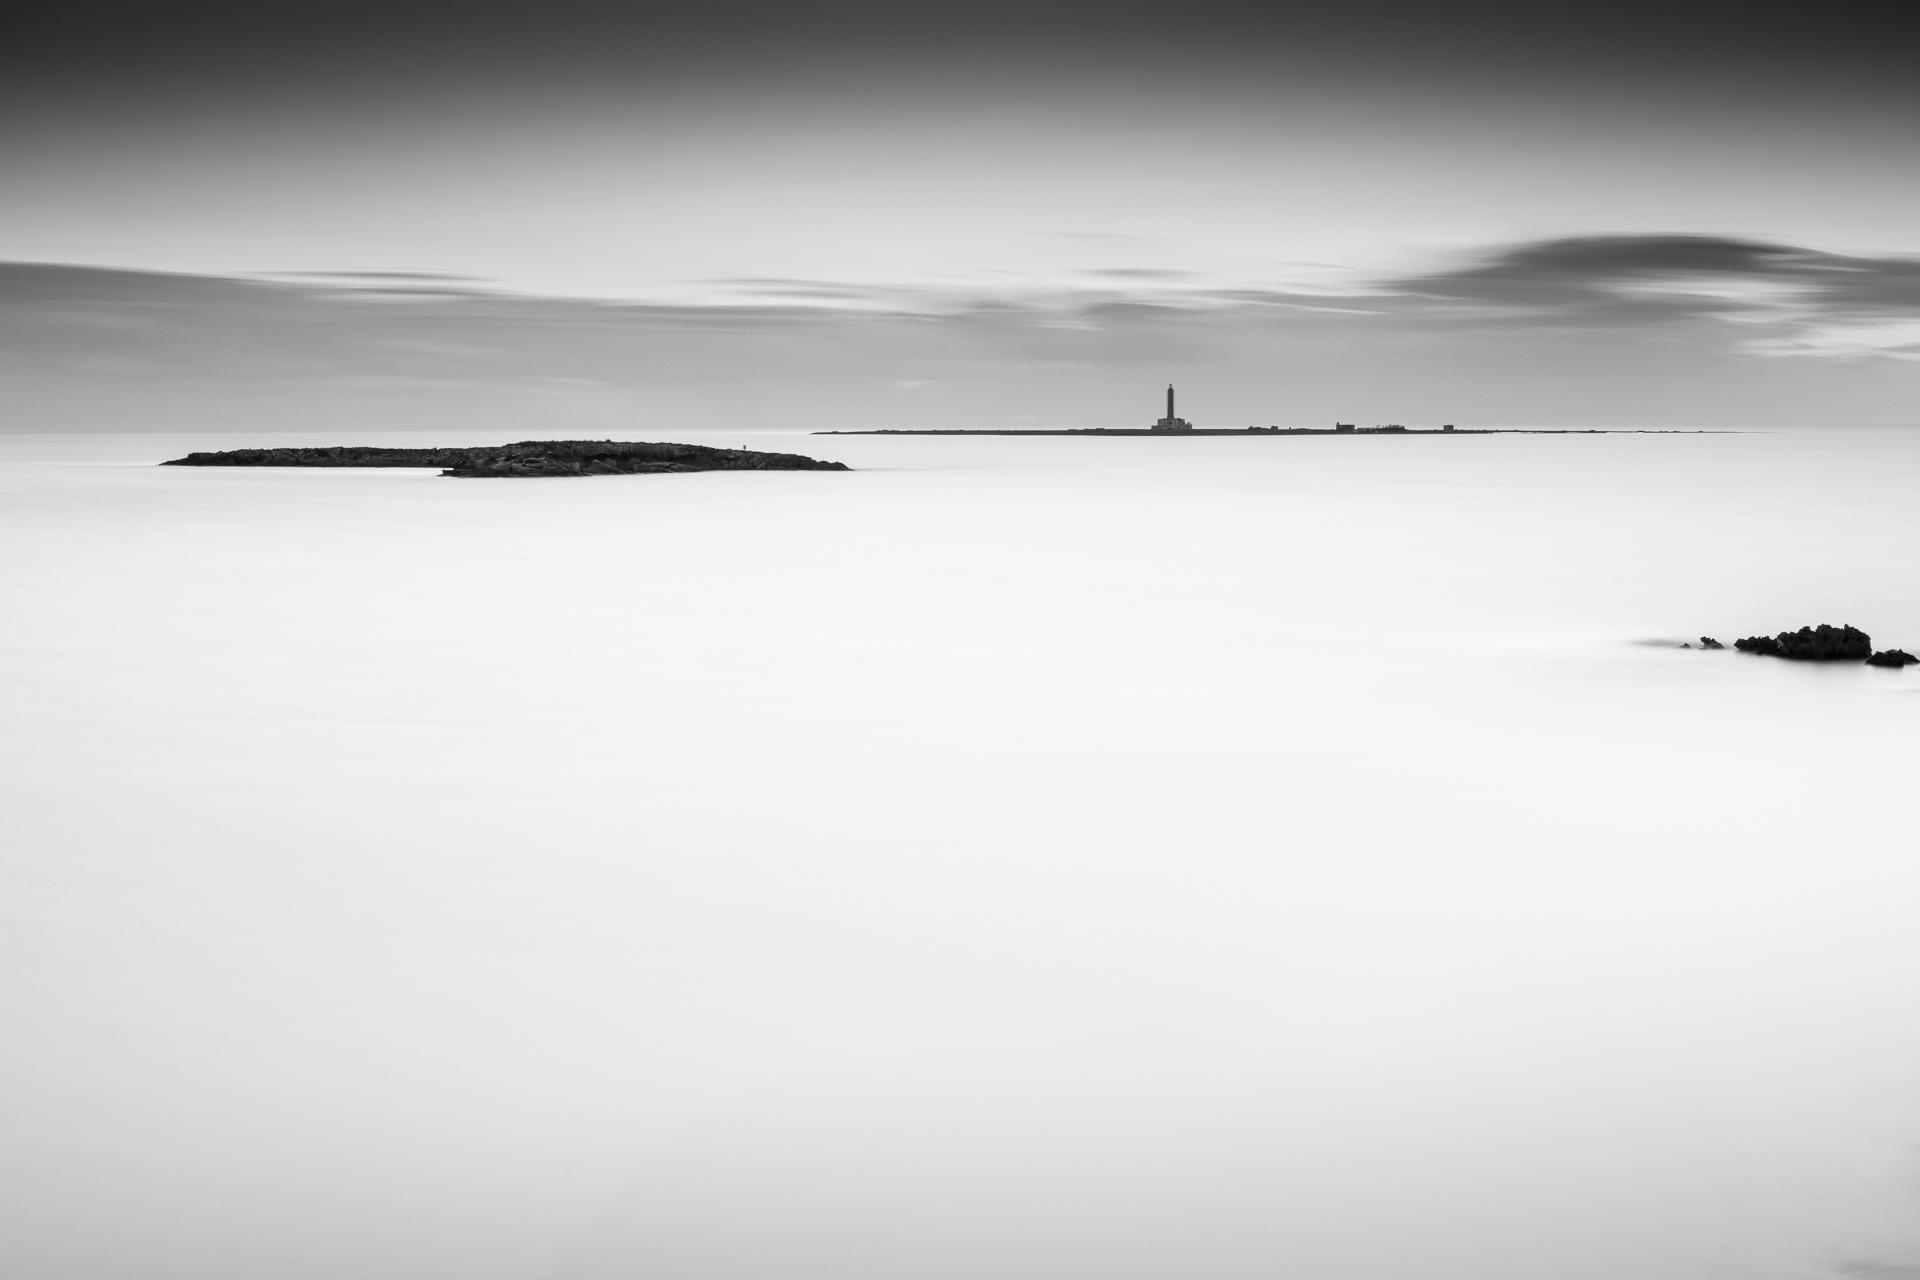 Gallipoli - Isola di Sant'Andrea, black and white long exposure photography